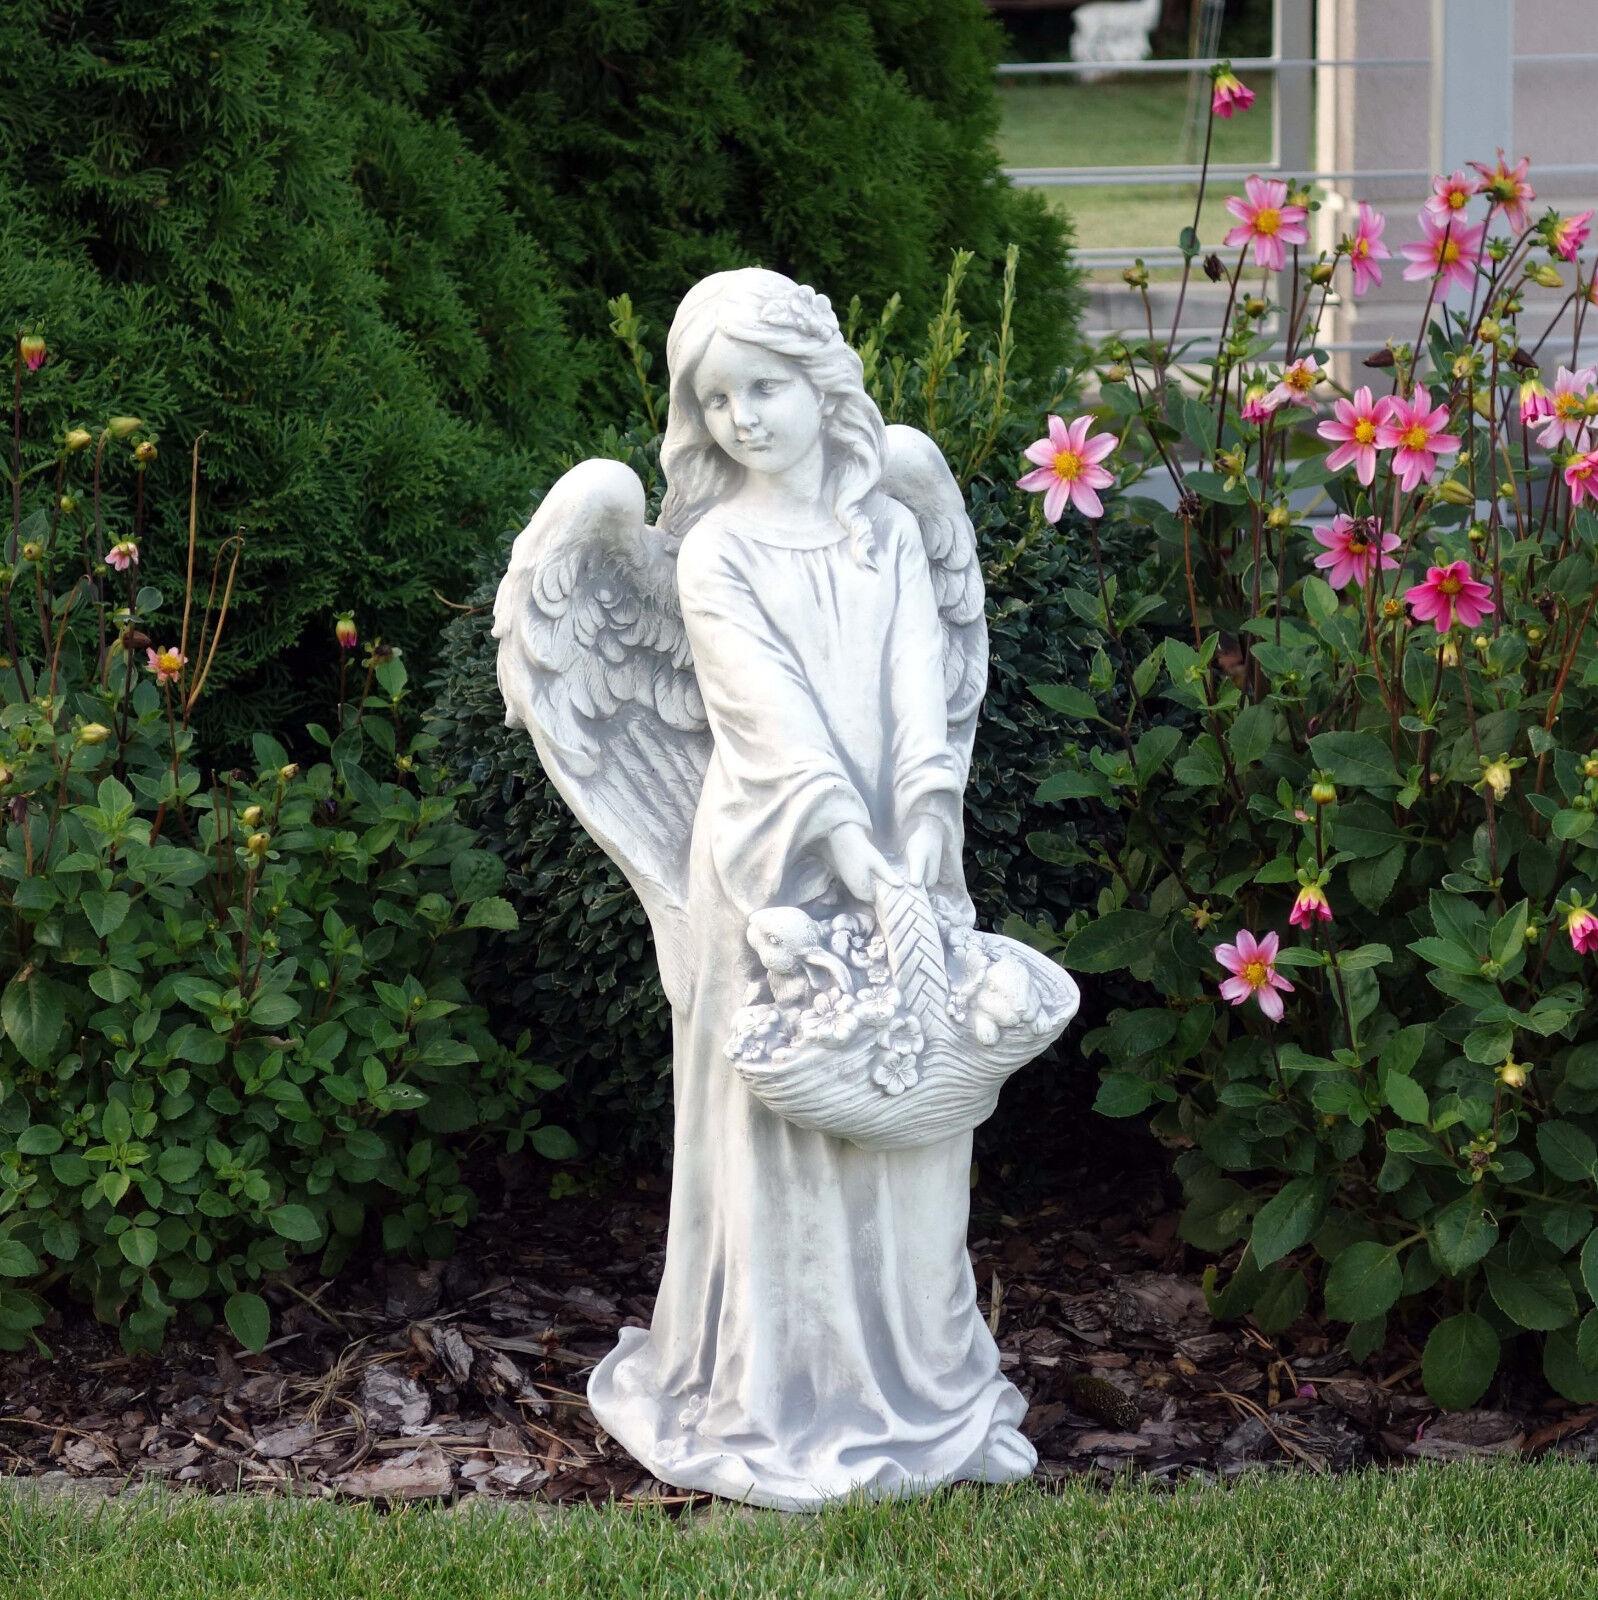 Top Modell Massive Steinfigur Engel mit Blaumenkorb Grabdeko Gartendeko Steinguss